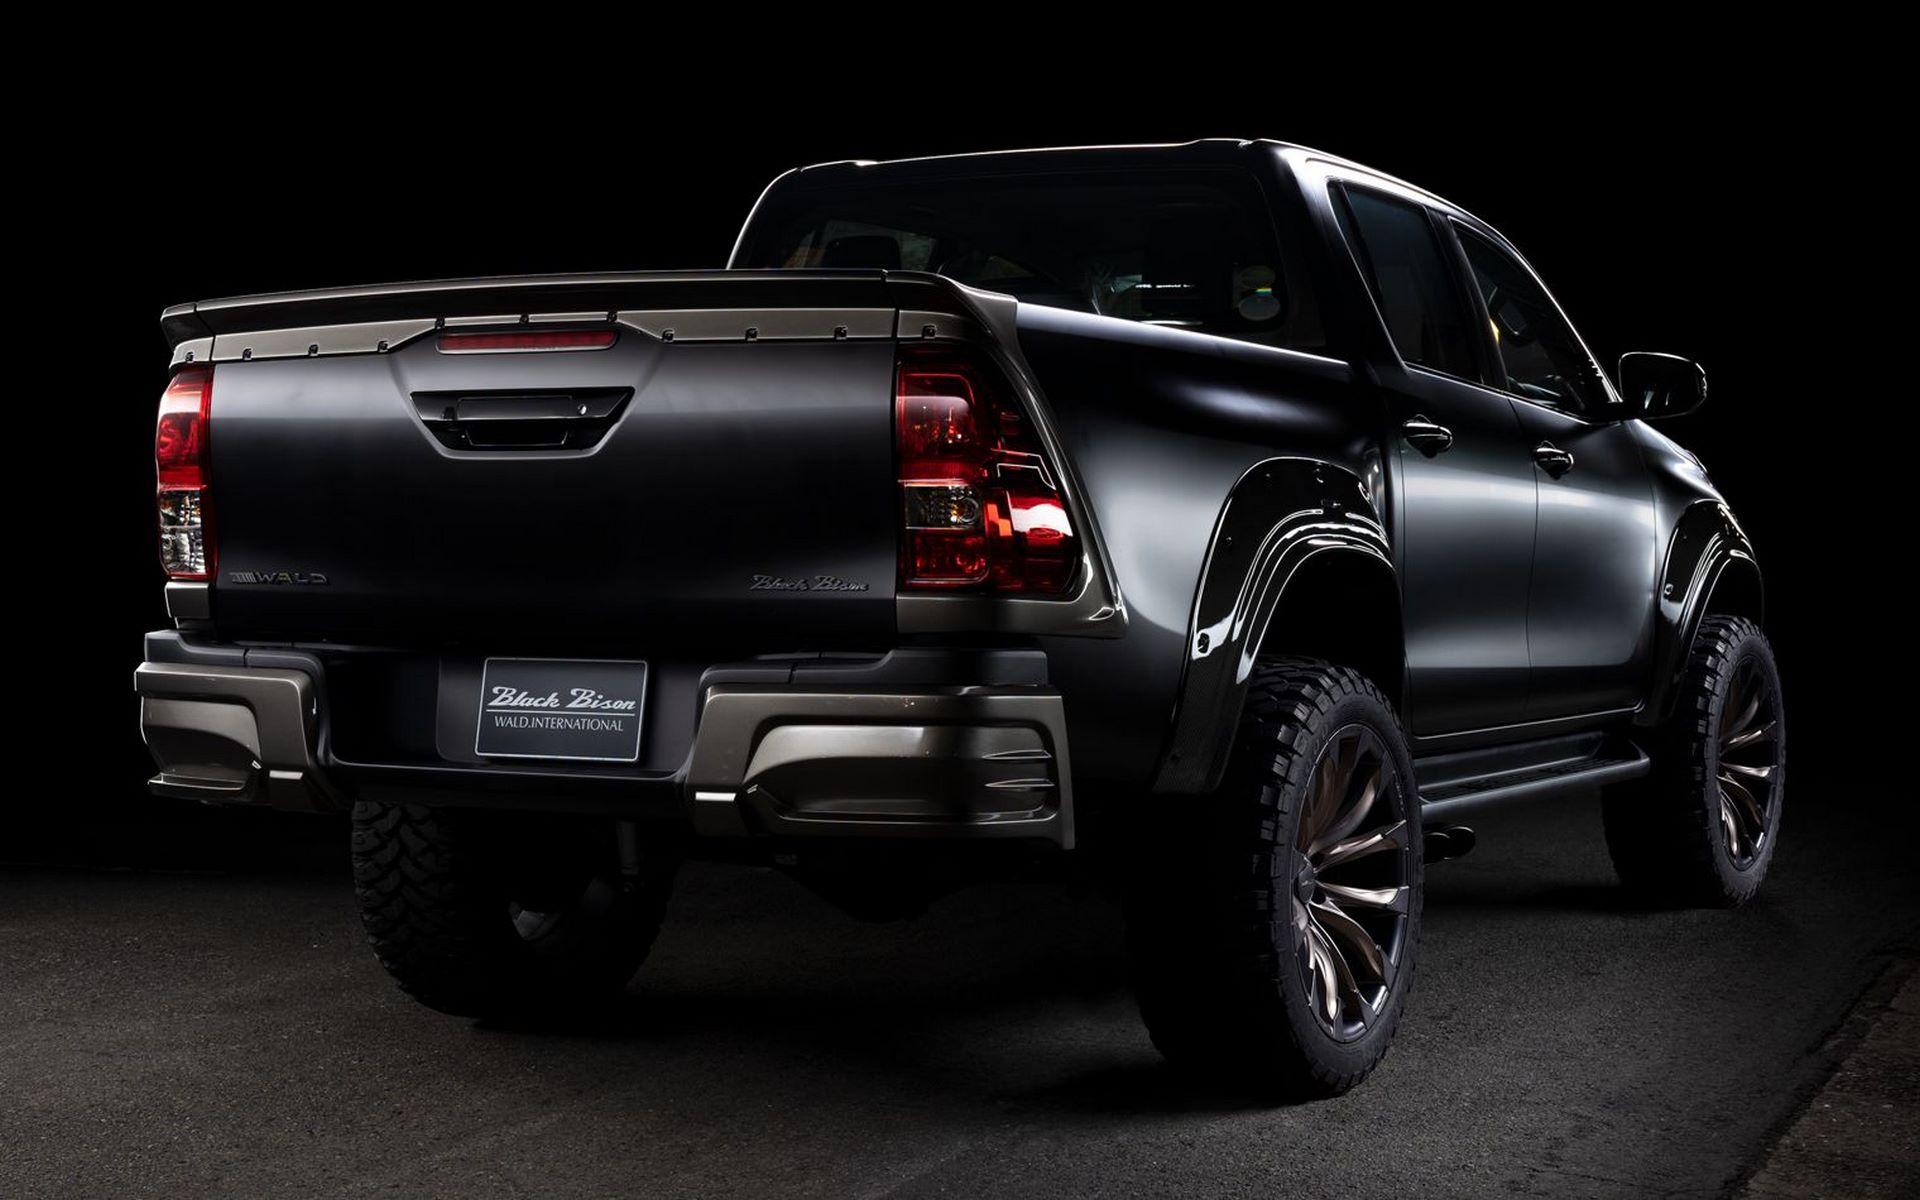 Toyota-Hilux-Black-Bison-by-Wald-International-6